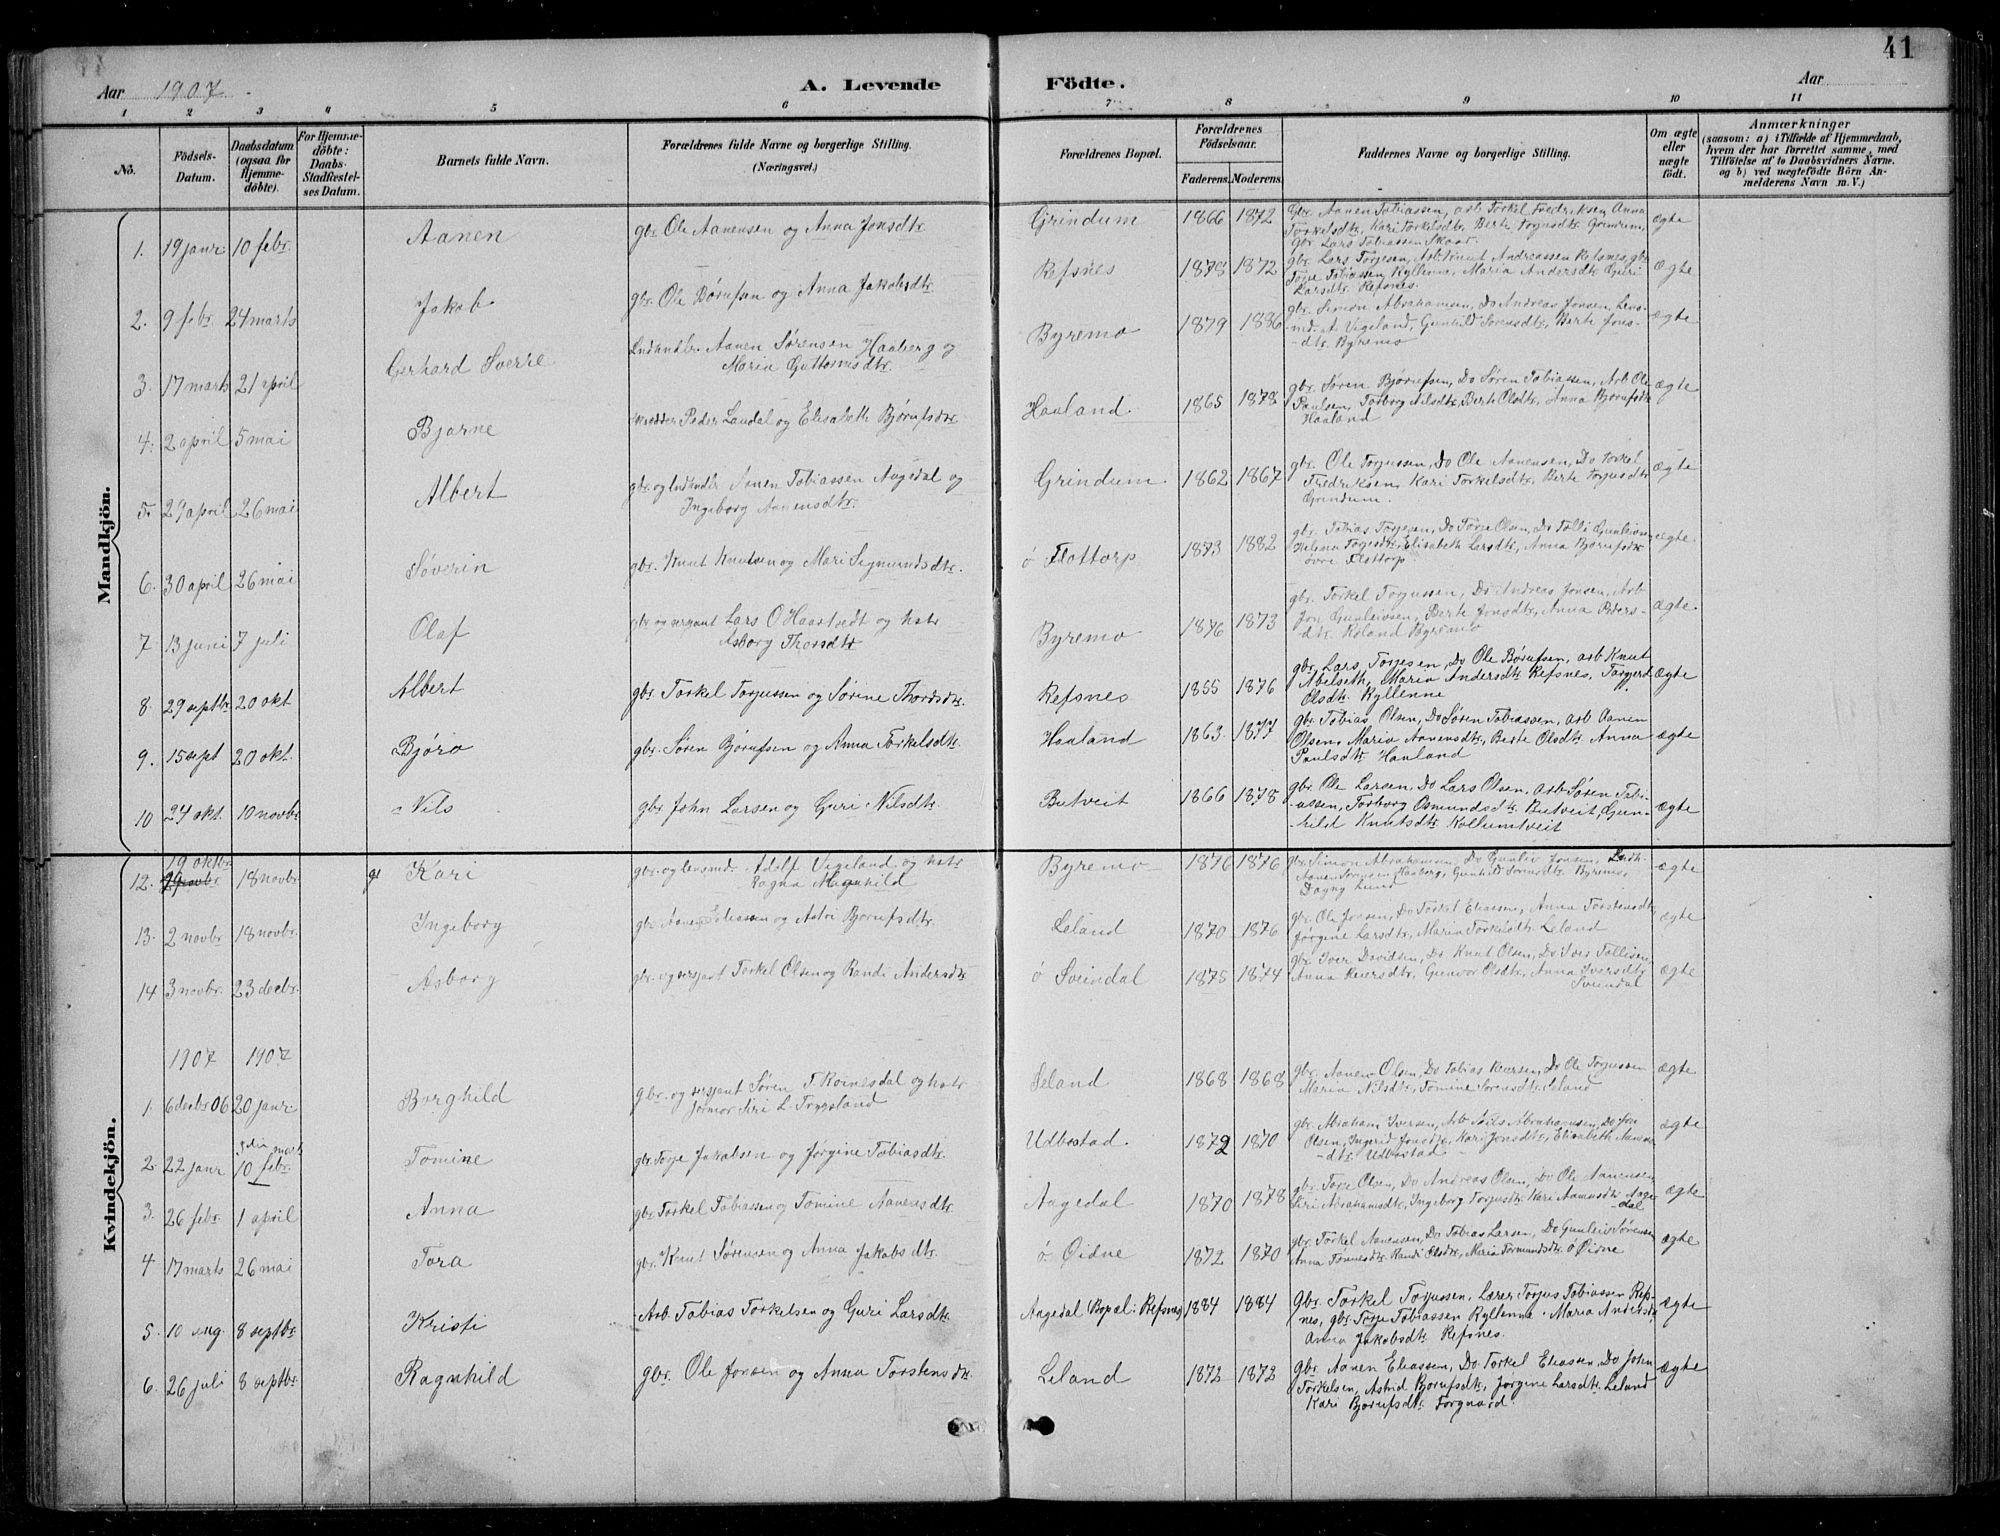 SAK, Bjelland sokneprestkontor, F/Fb/Fbc/L0003: Klokkerbok nr. B 3, 1887-1924, s. 41